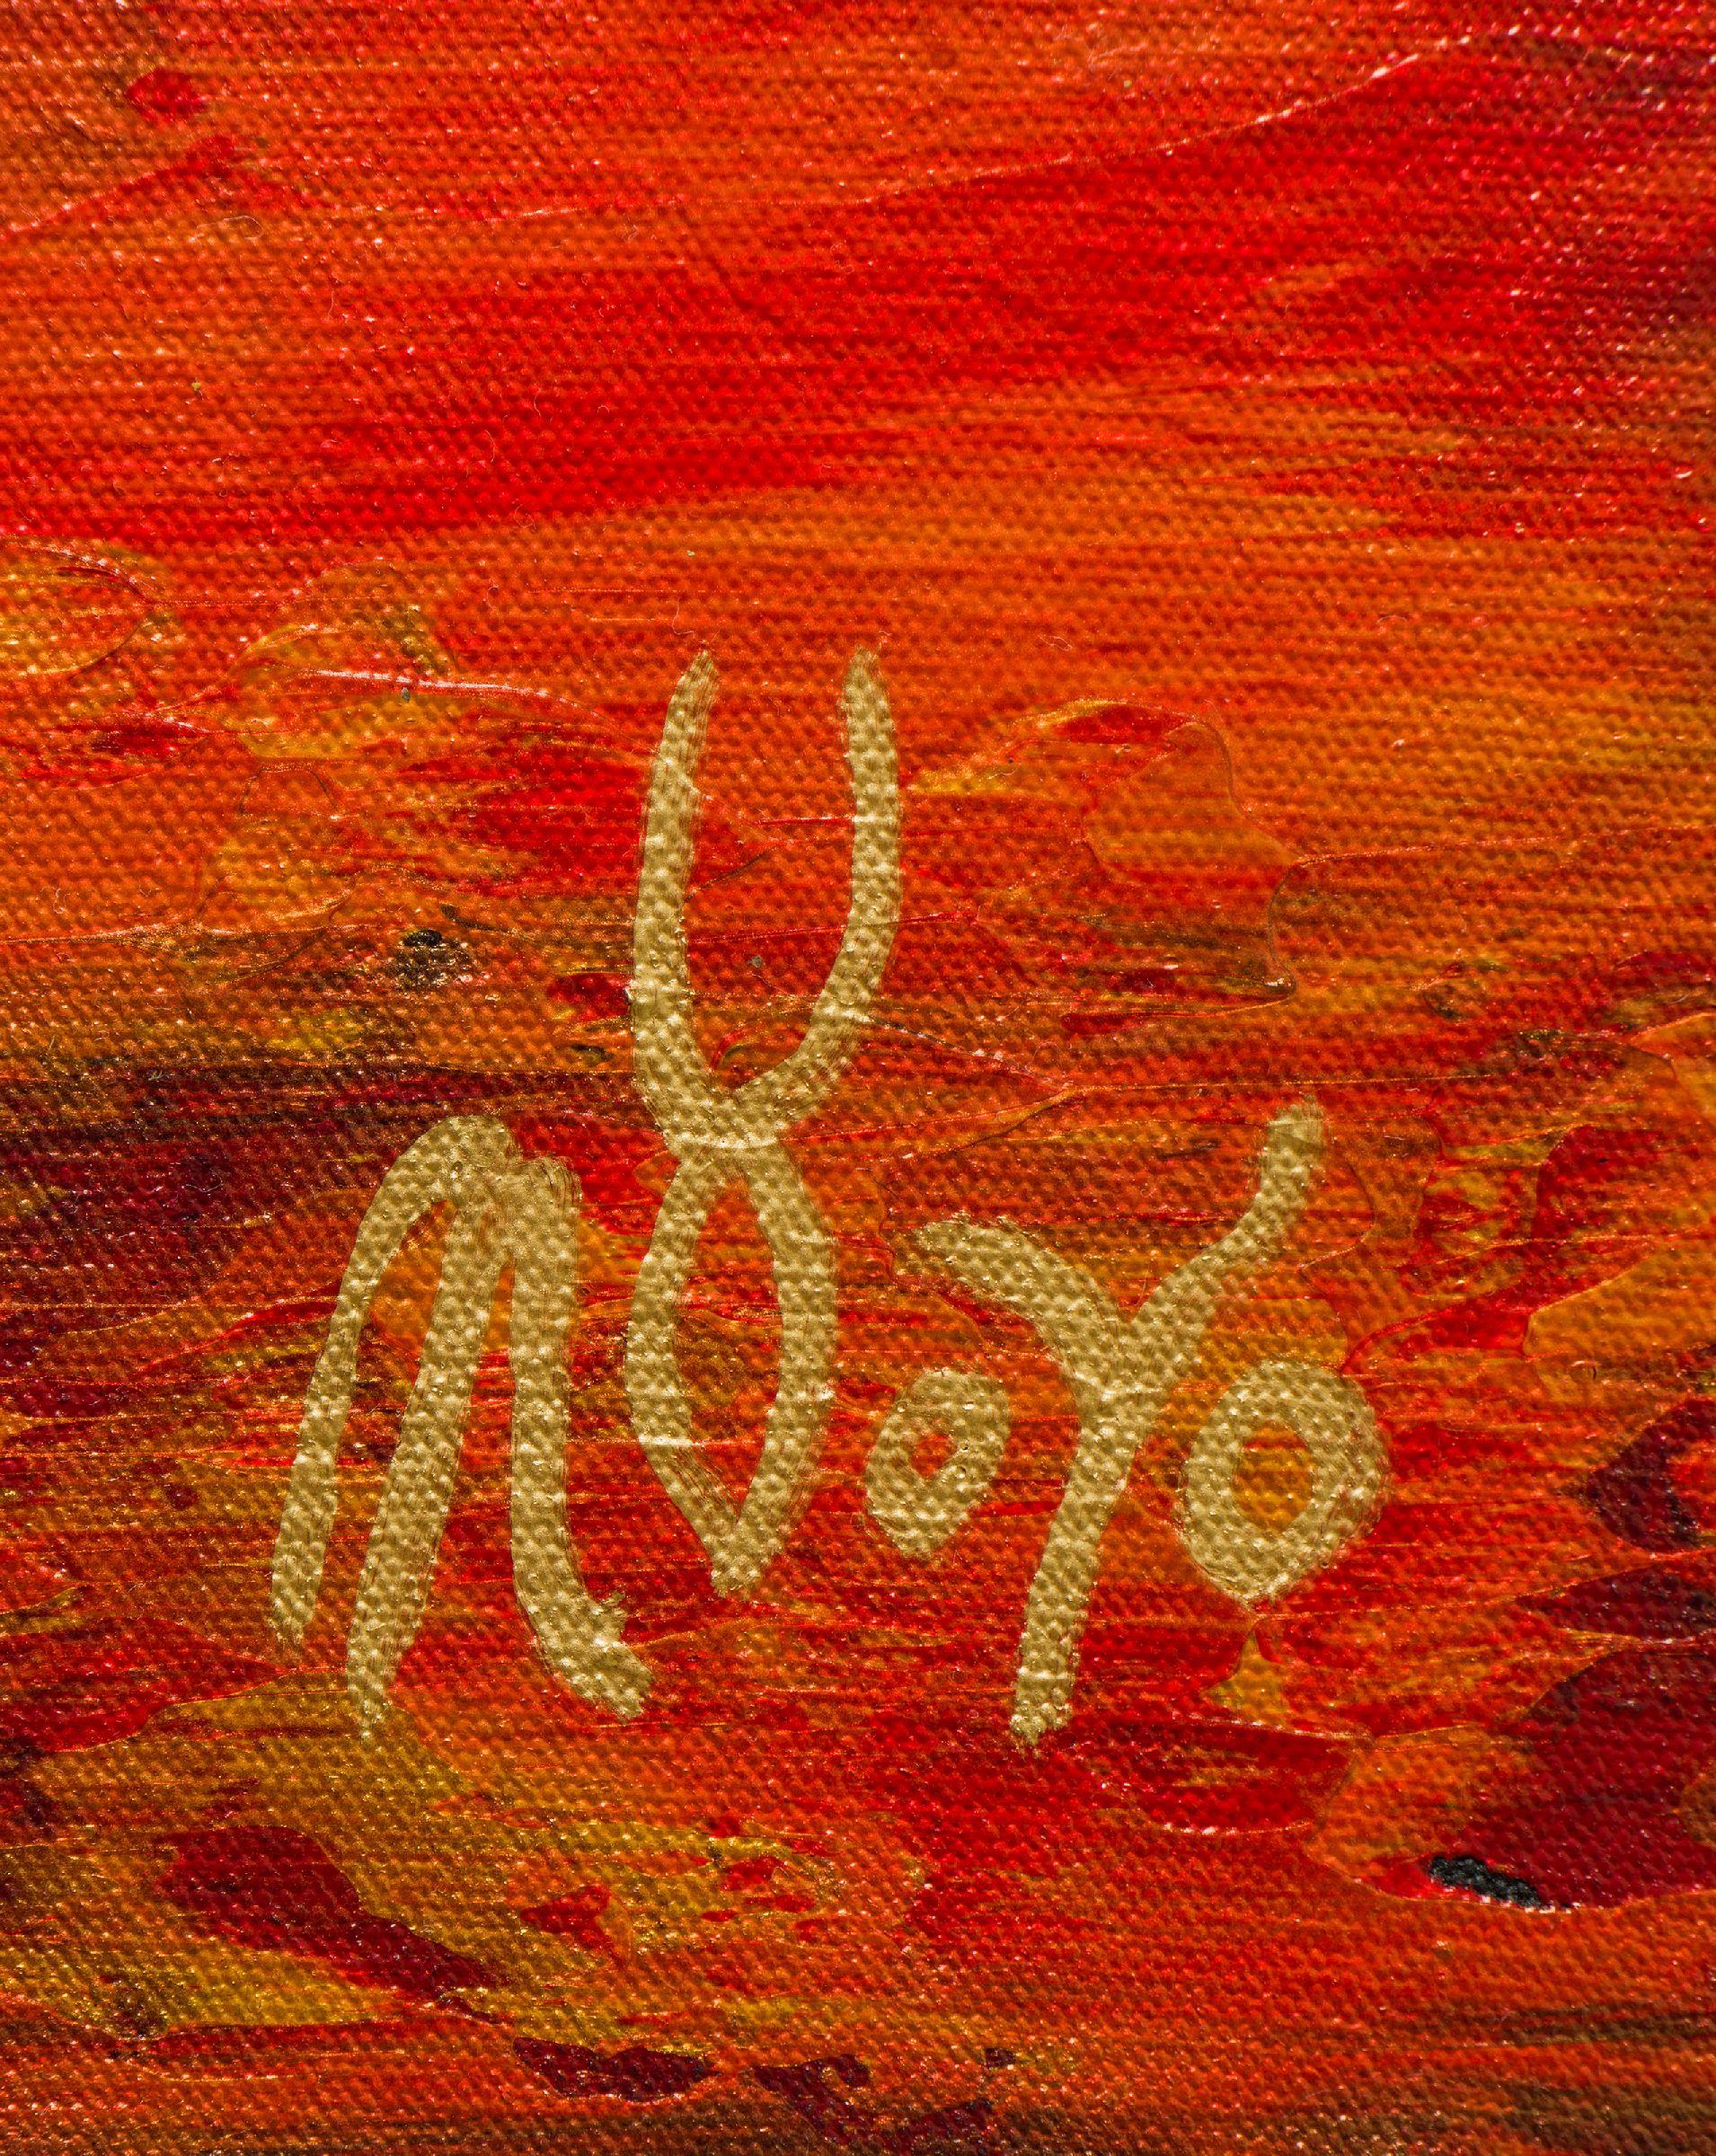 Signature - Fiery dimensions 3 (2020) by Nestor Toro